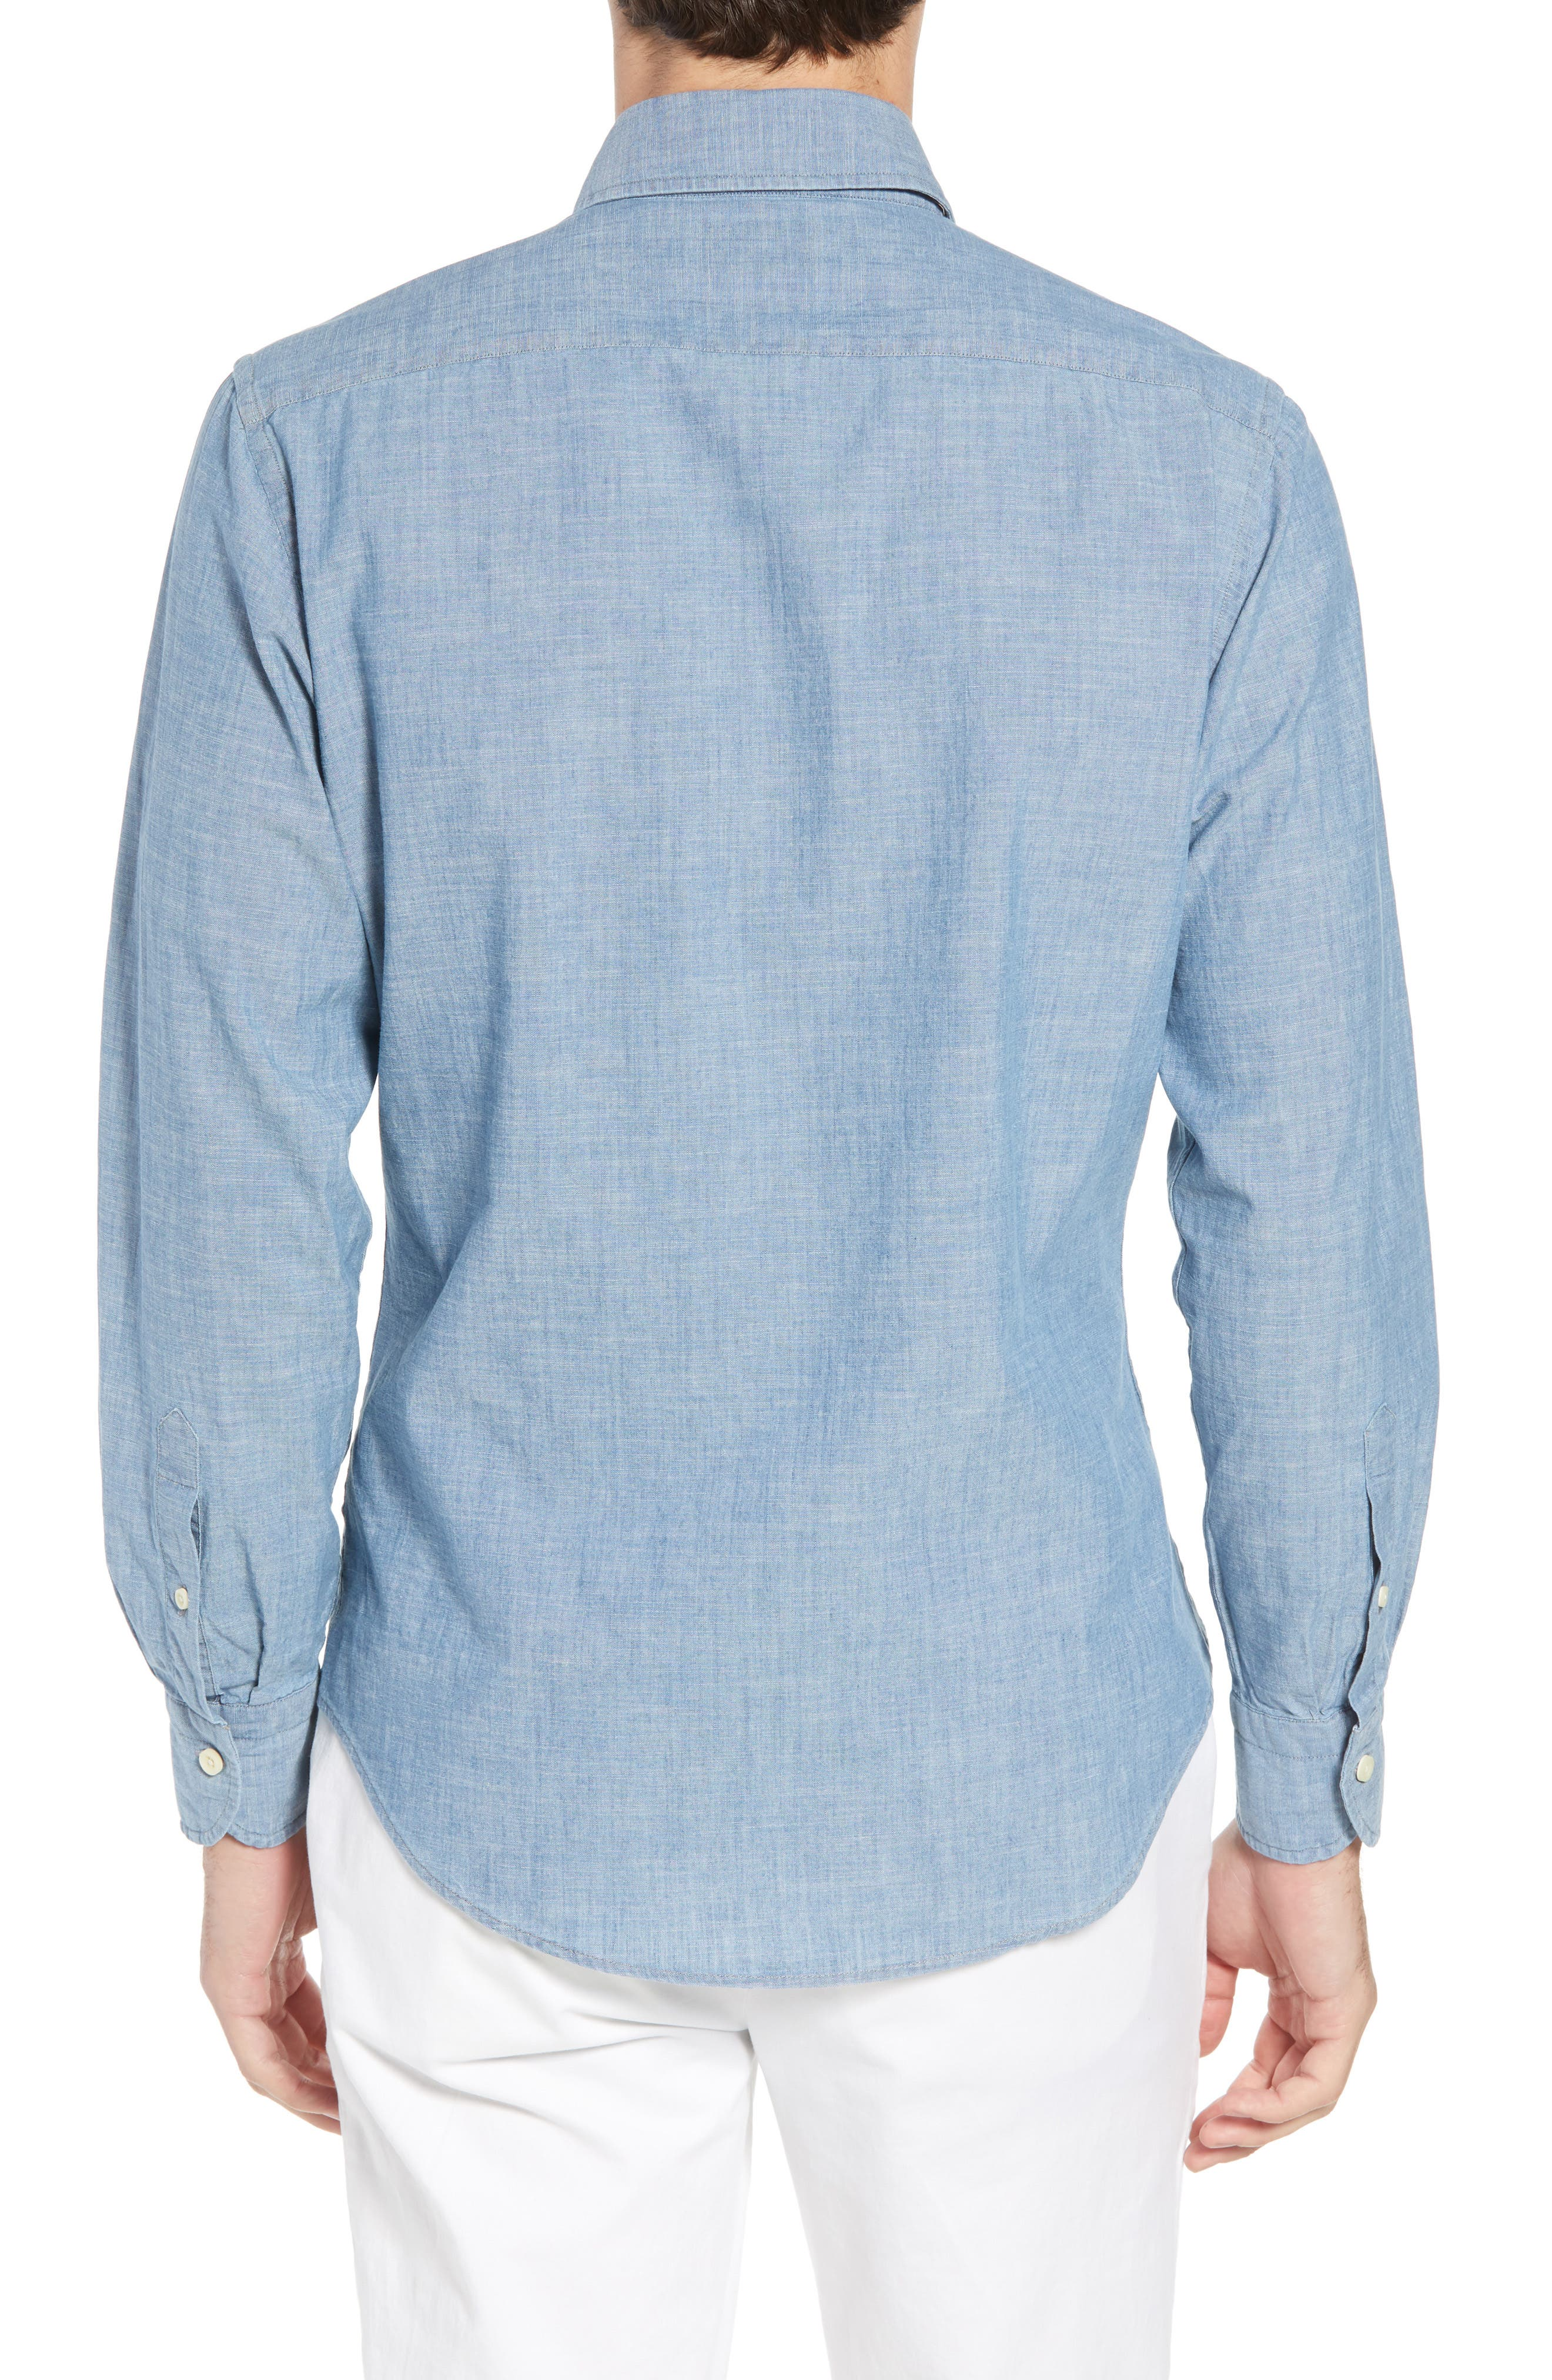 Ancroft Slim Fit Chambray Sport Shirt,                             Alternate thumbnail 2, color,                             400